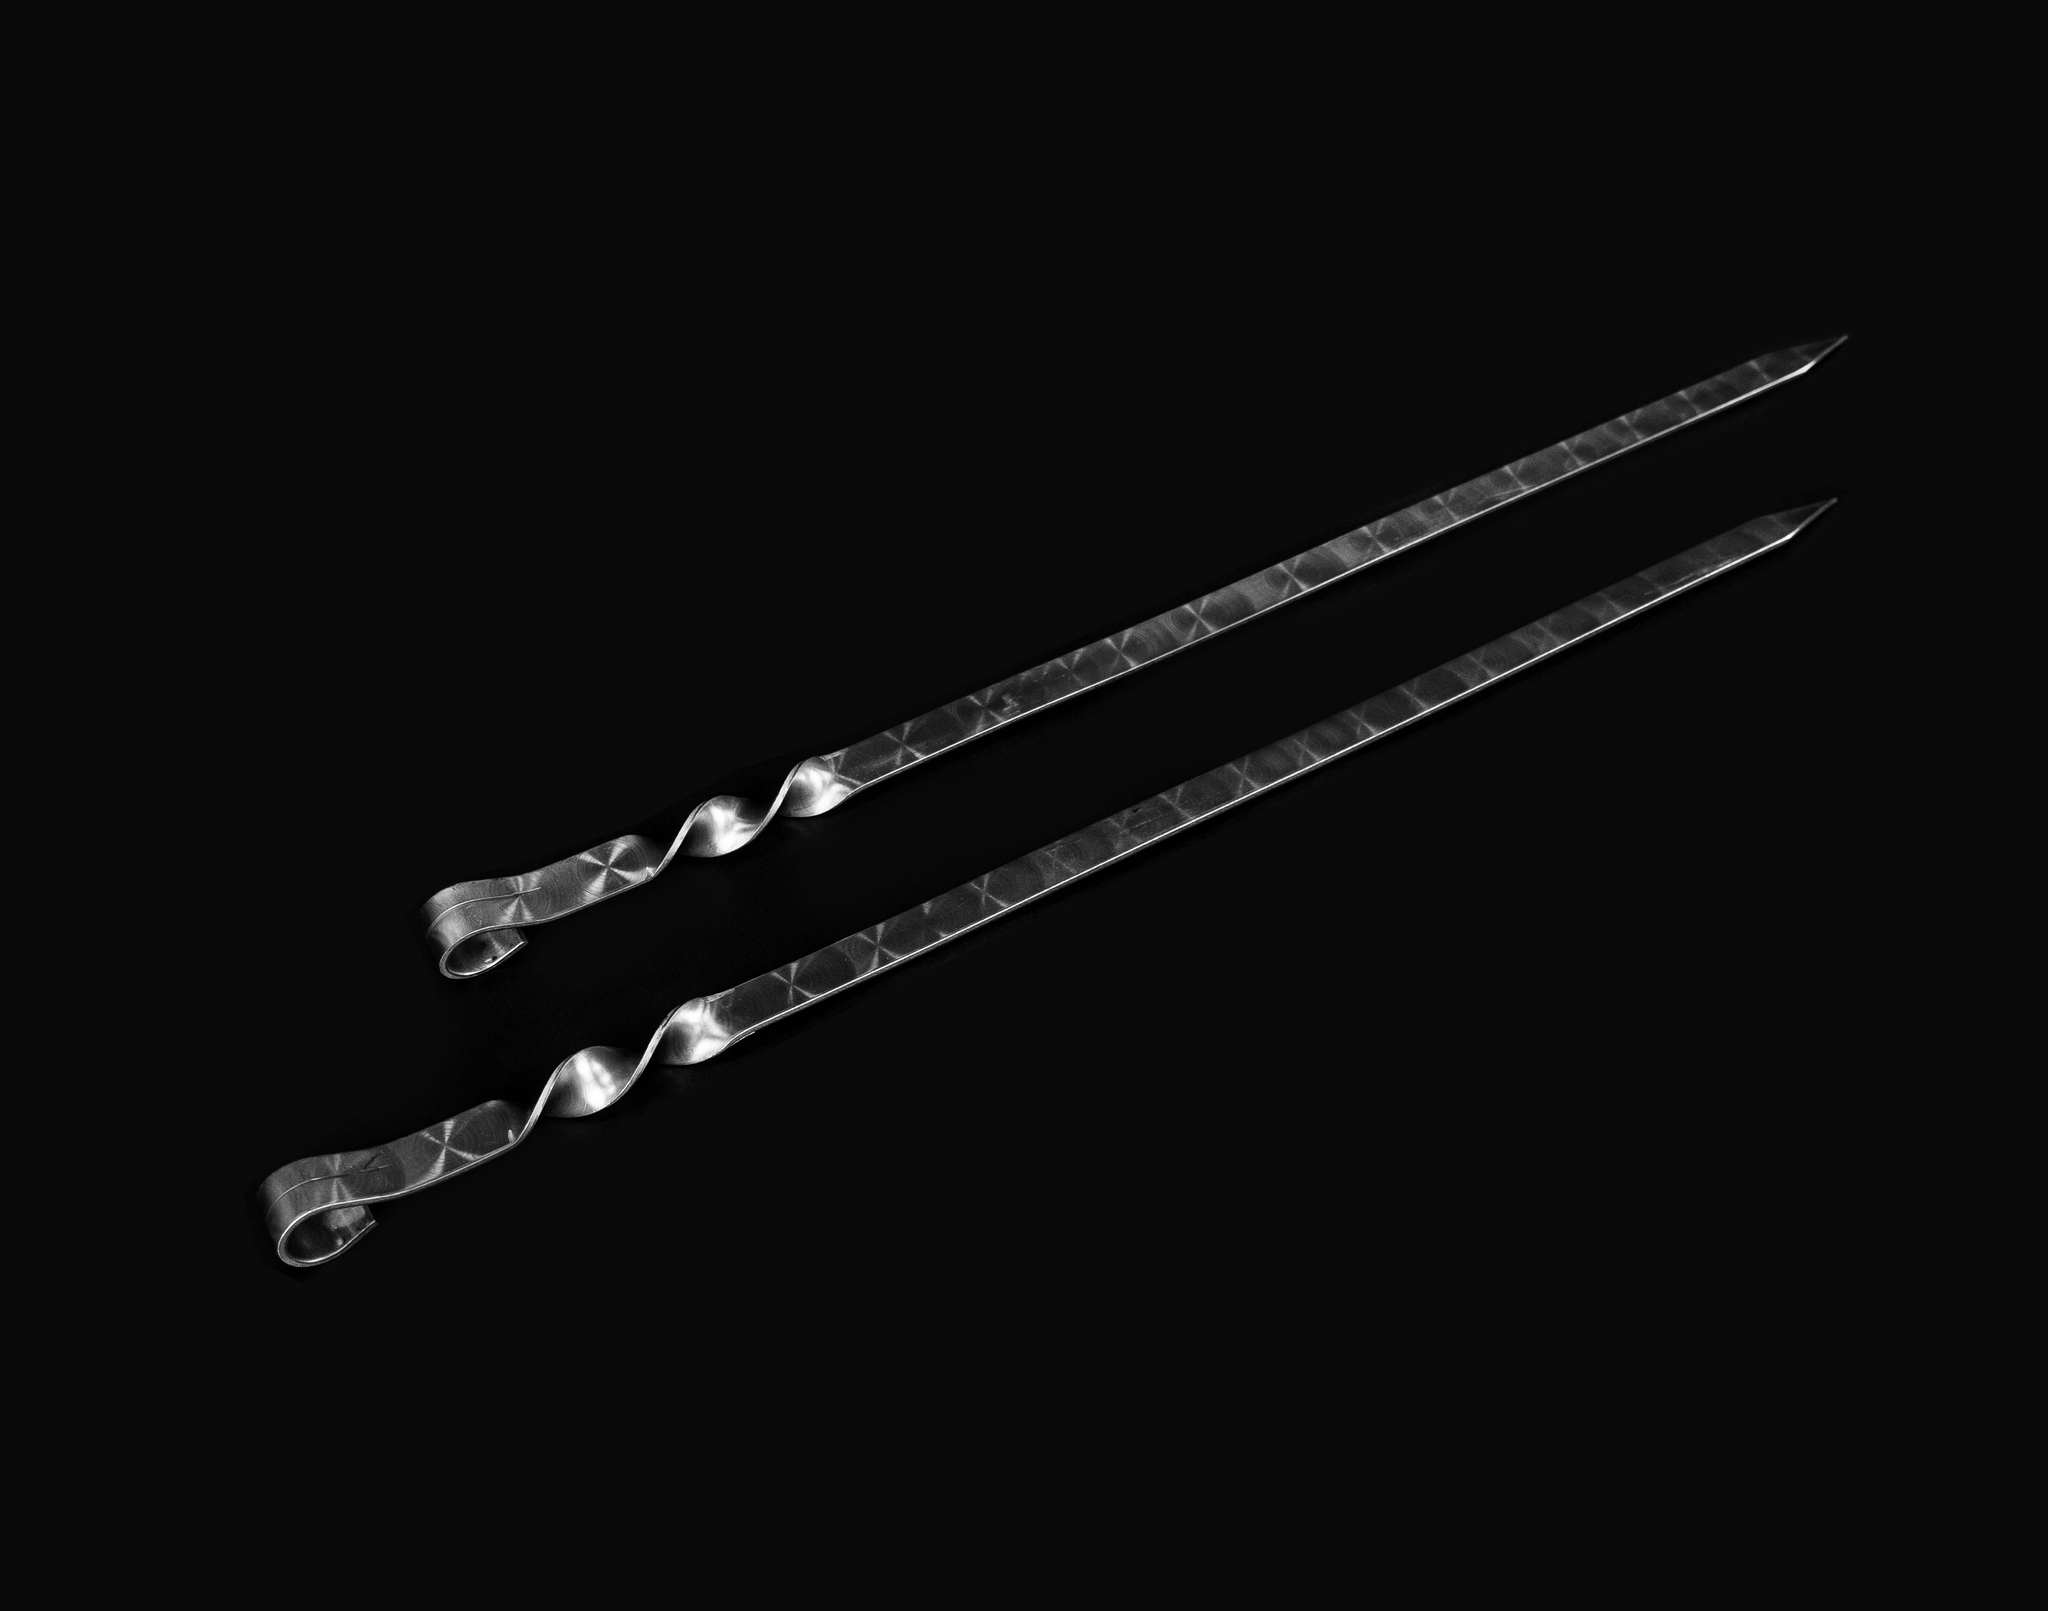 Шампуры из нержавейки Шампур для Люля-кебаб 3мм (ширина 20мм) P1244085-0.jpg